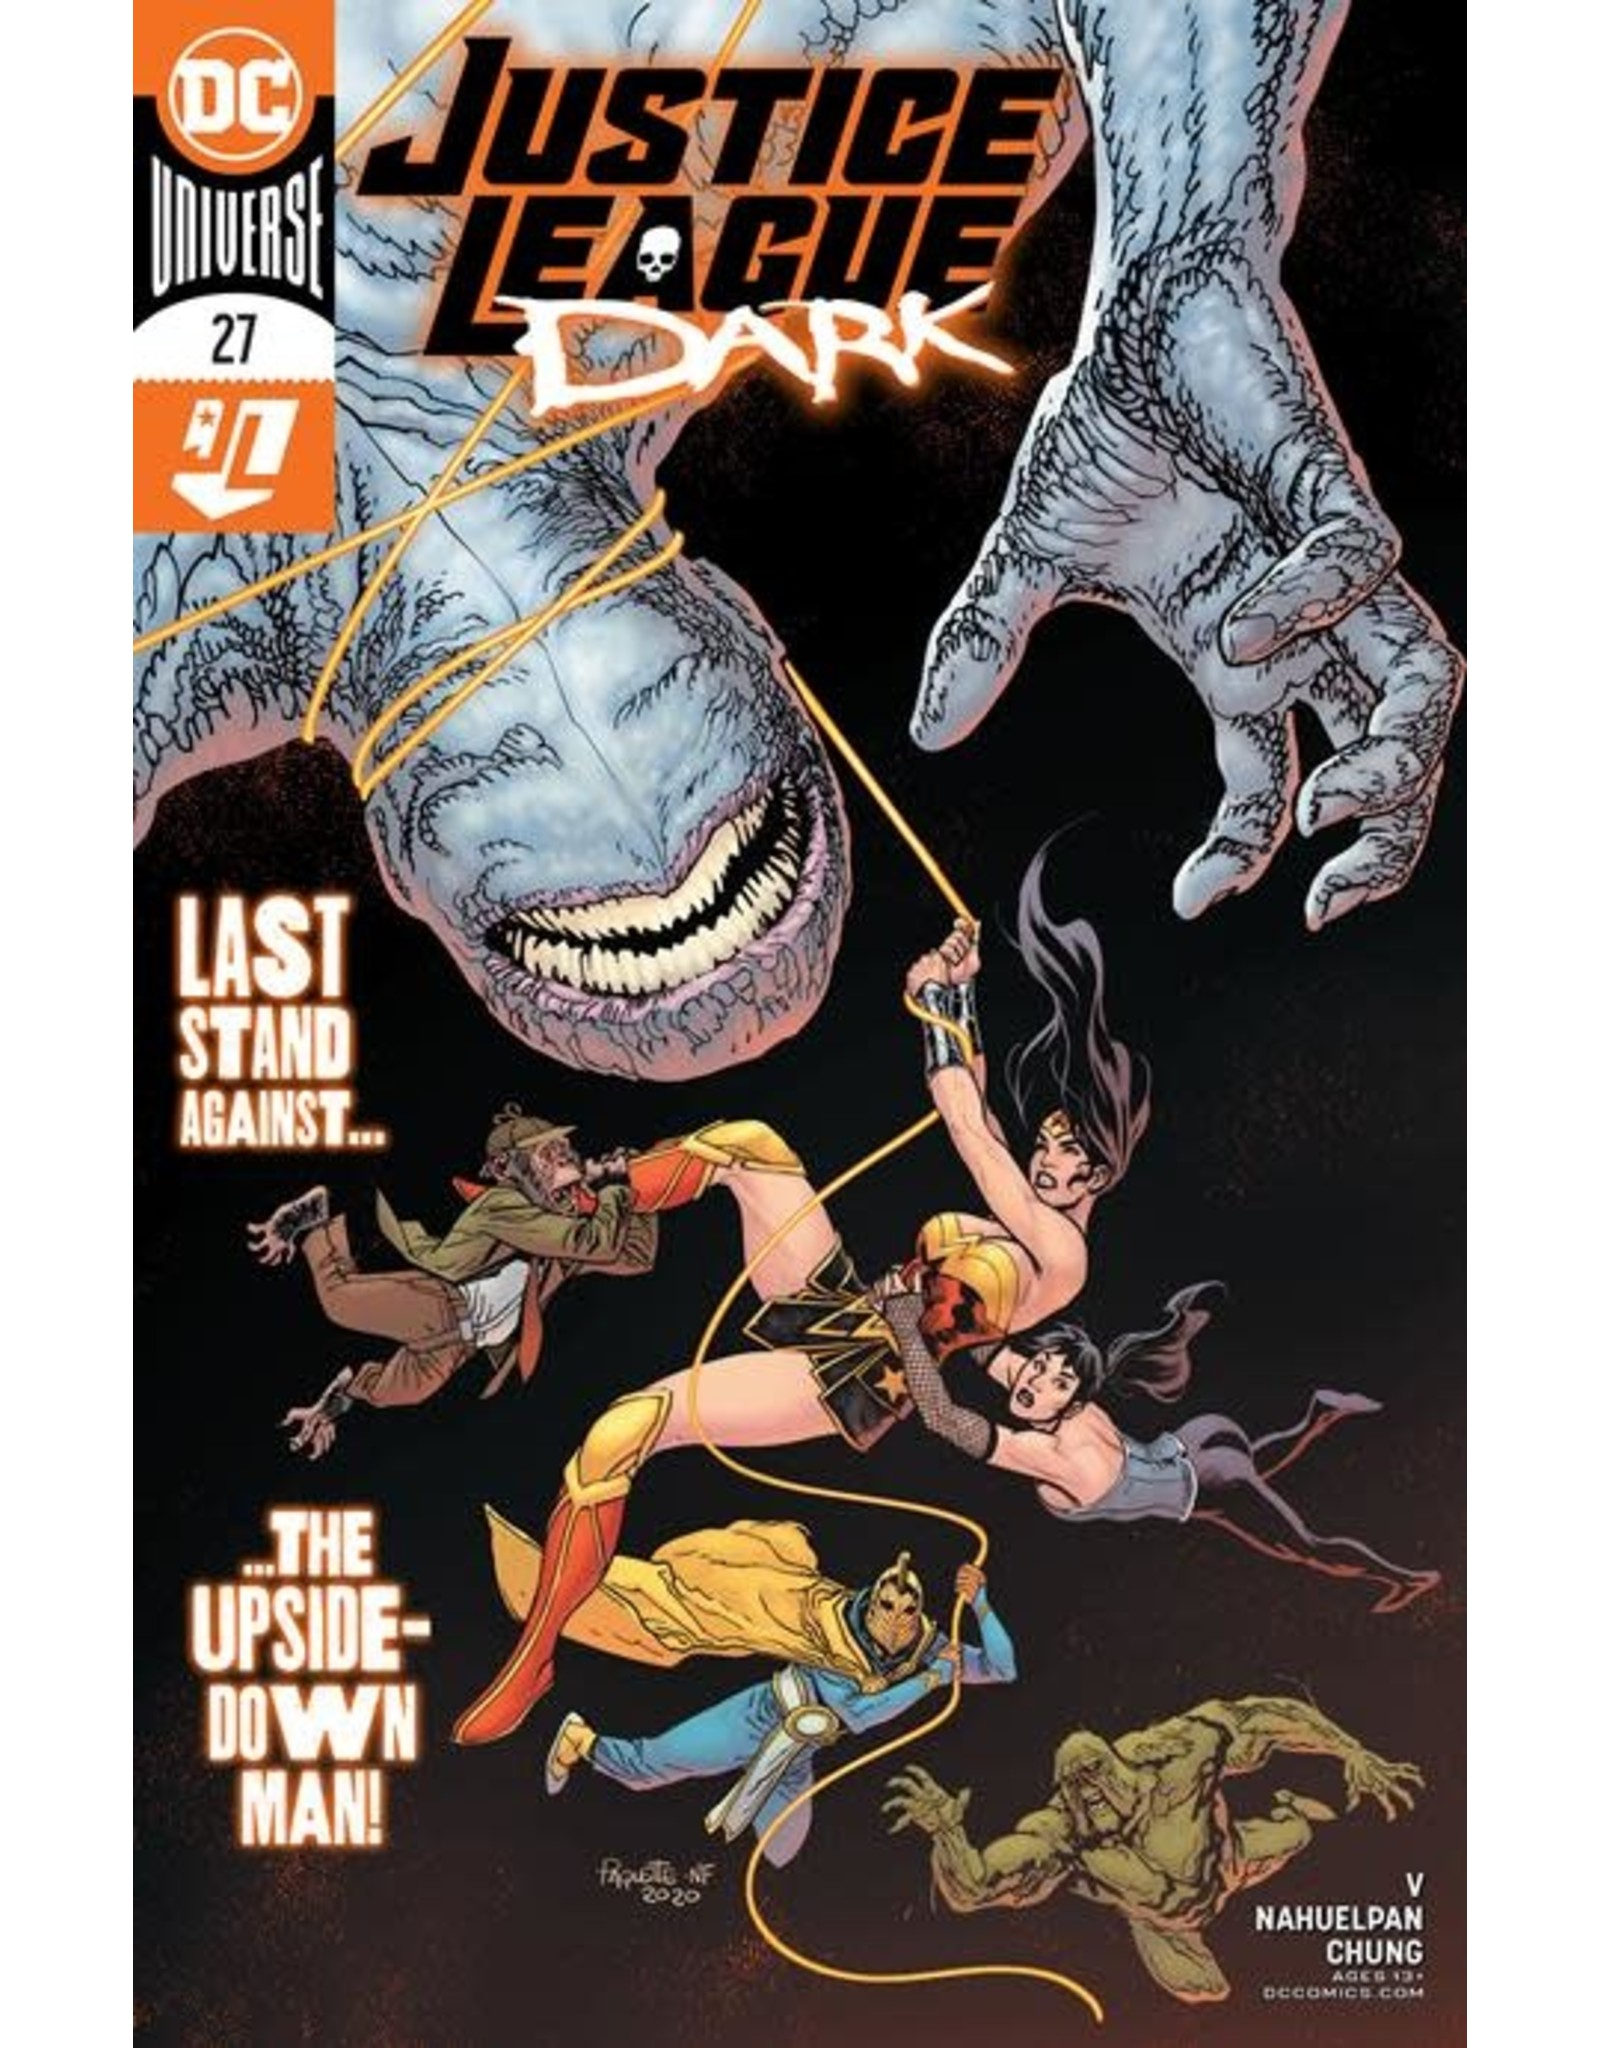 DC Comics JUSTICE LEAGUE DARK #27 CVR A YANICK PAQUETTE